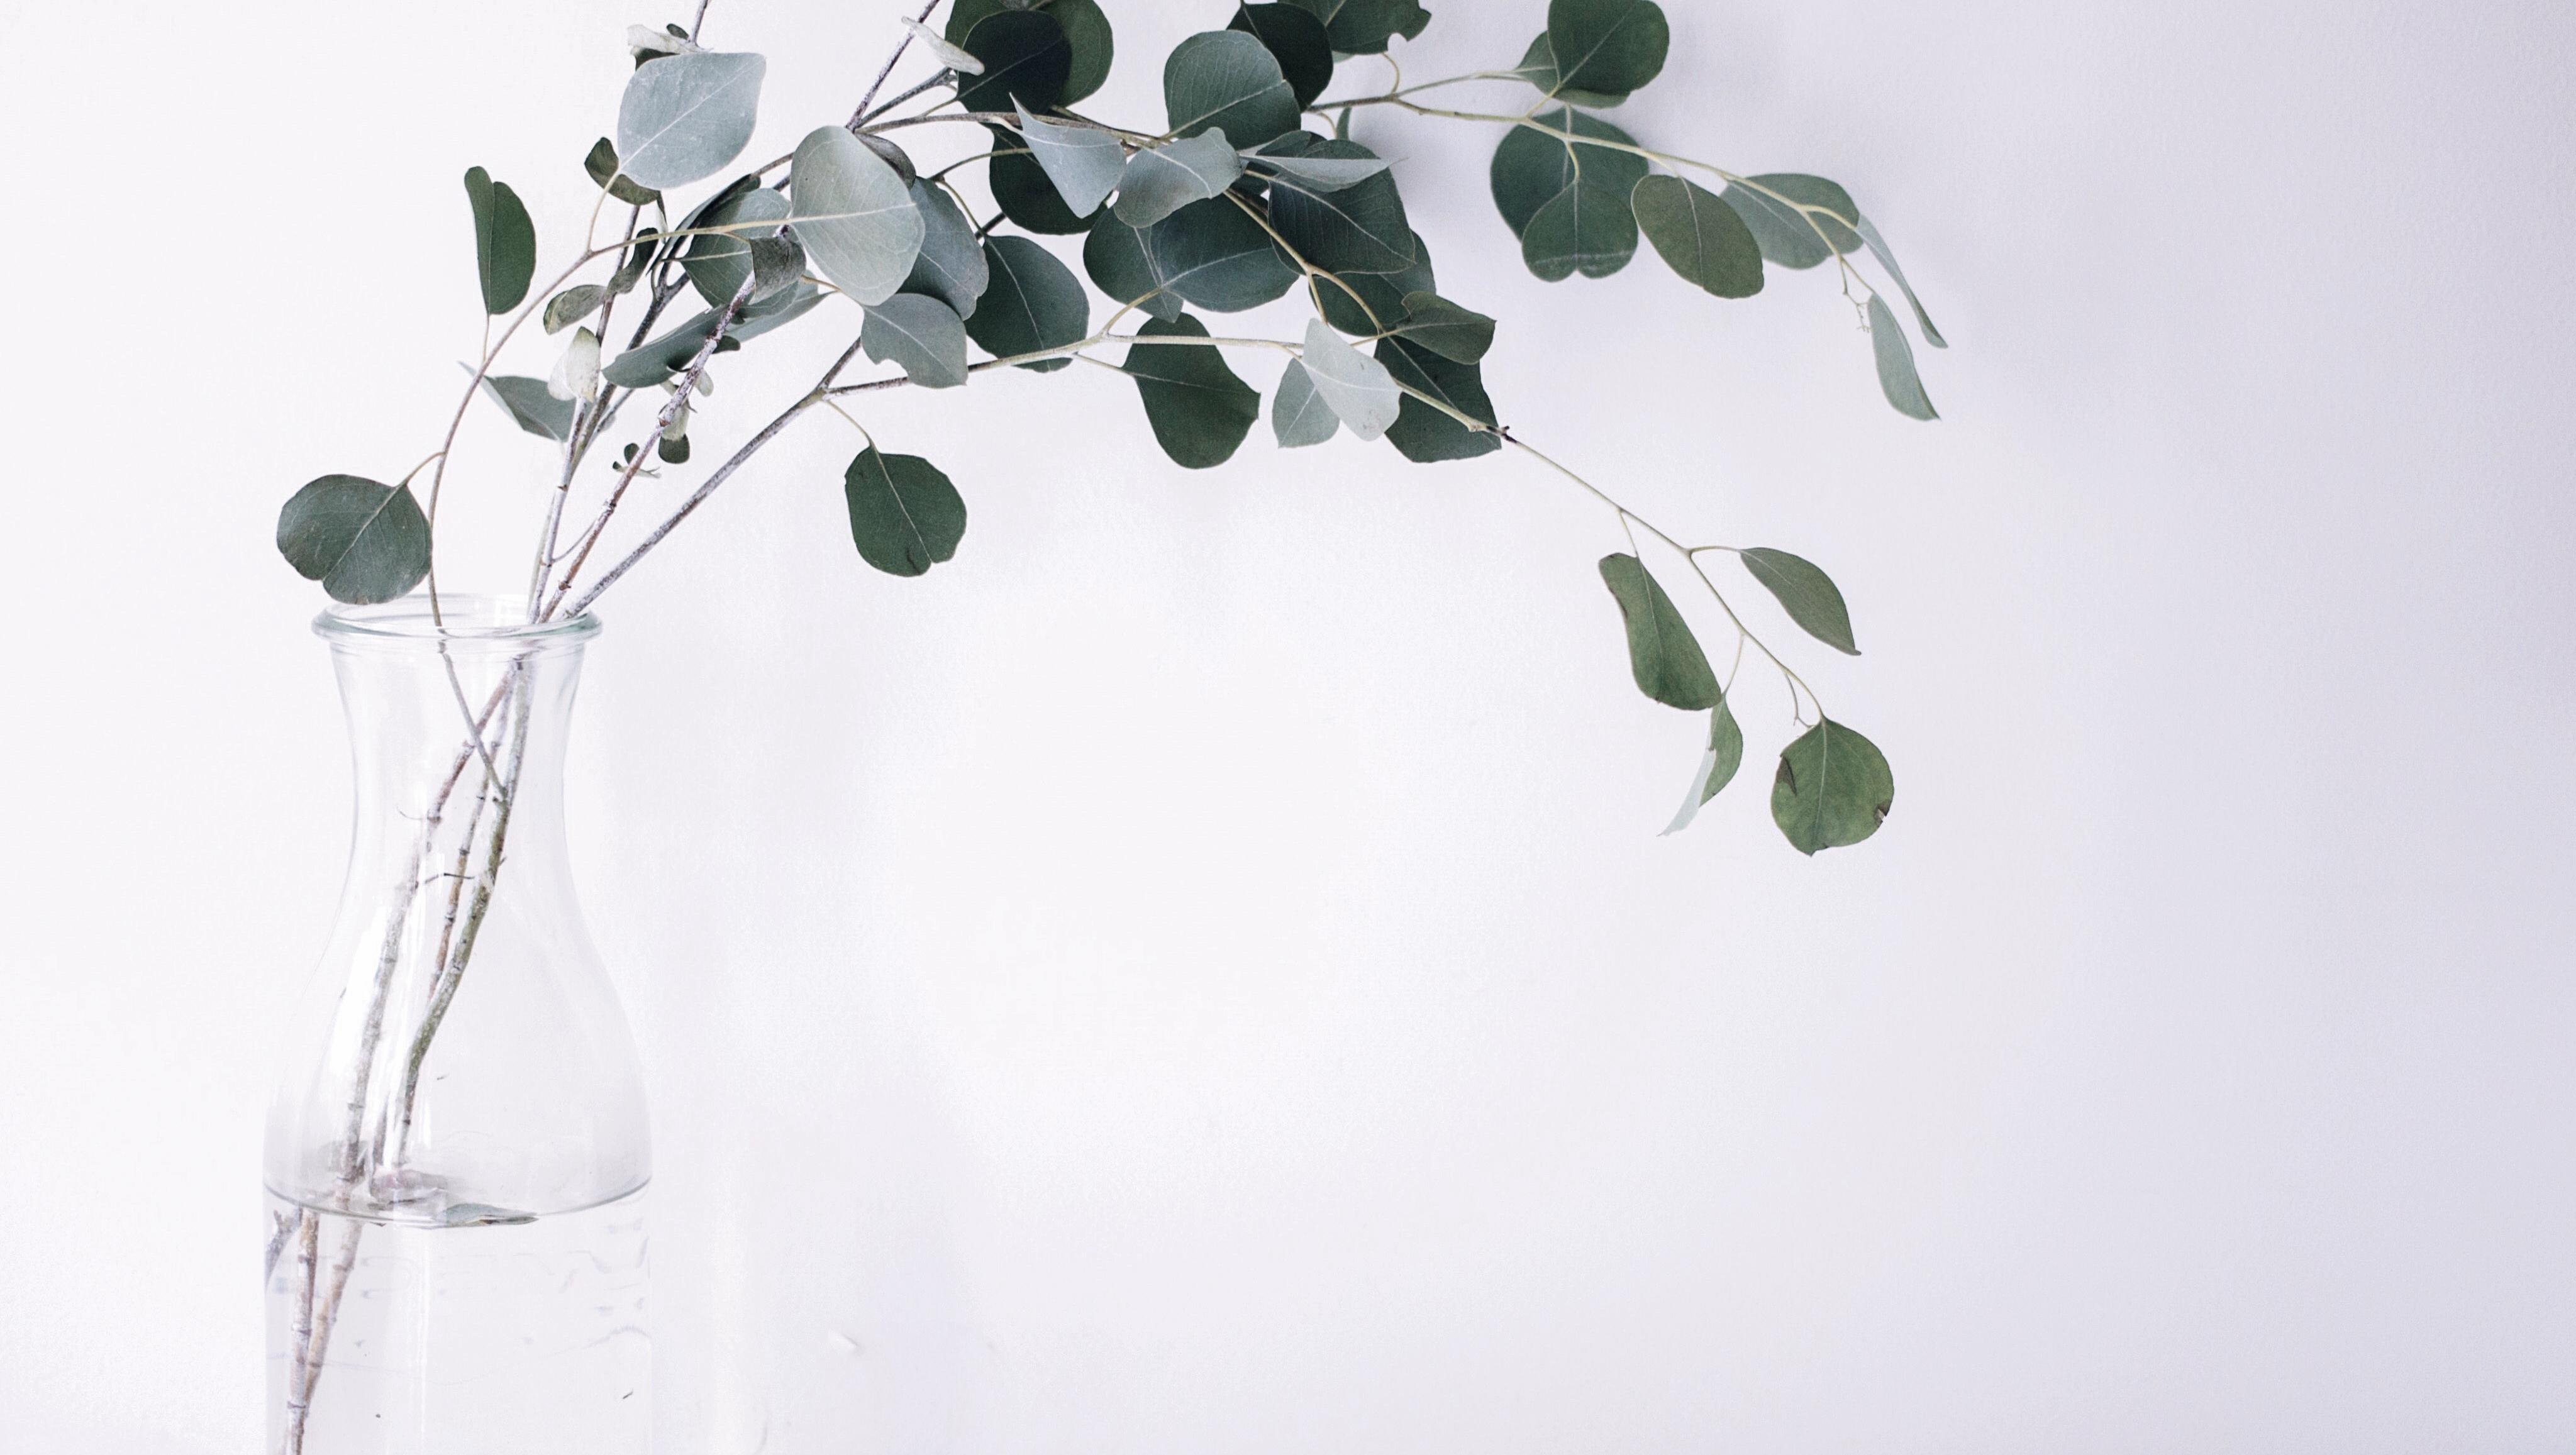 minimalismo-tempo-simplificar-the-minimal-magazine